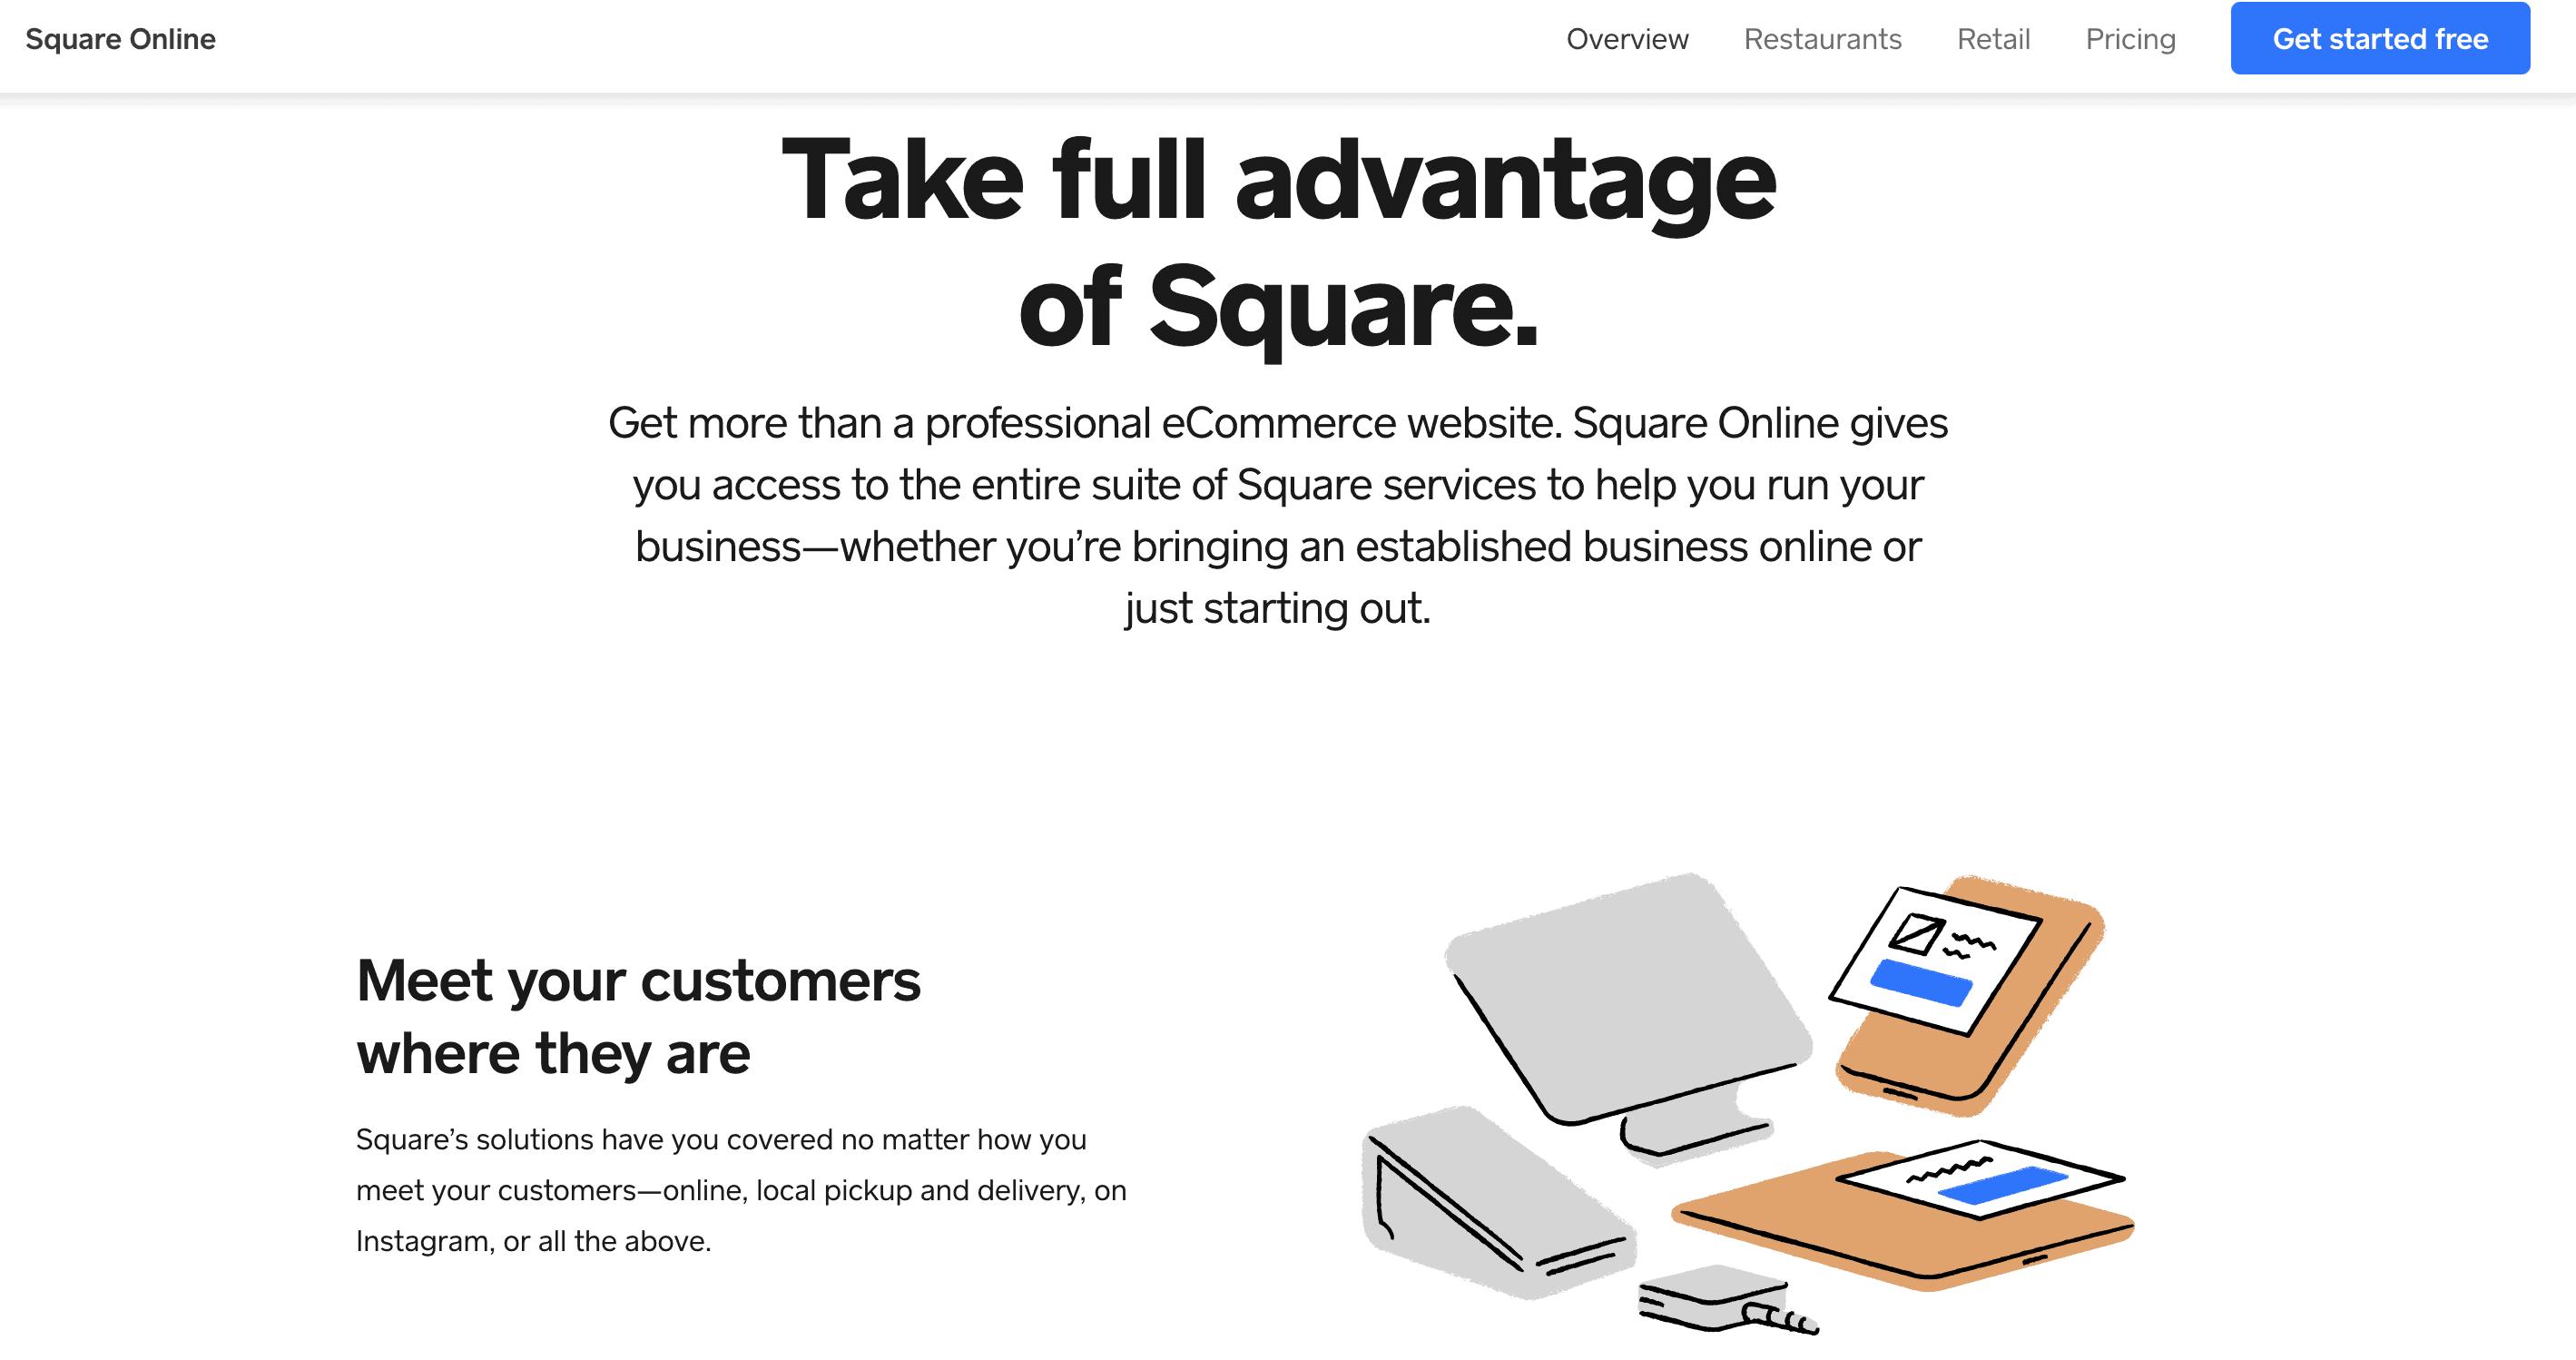 square online store website informational screenshot